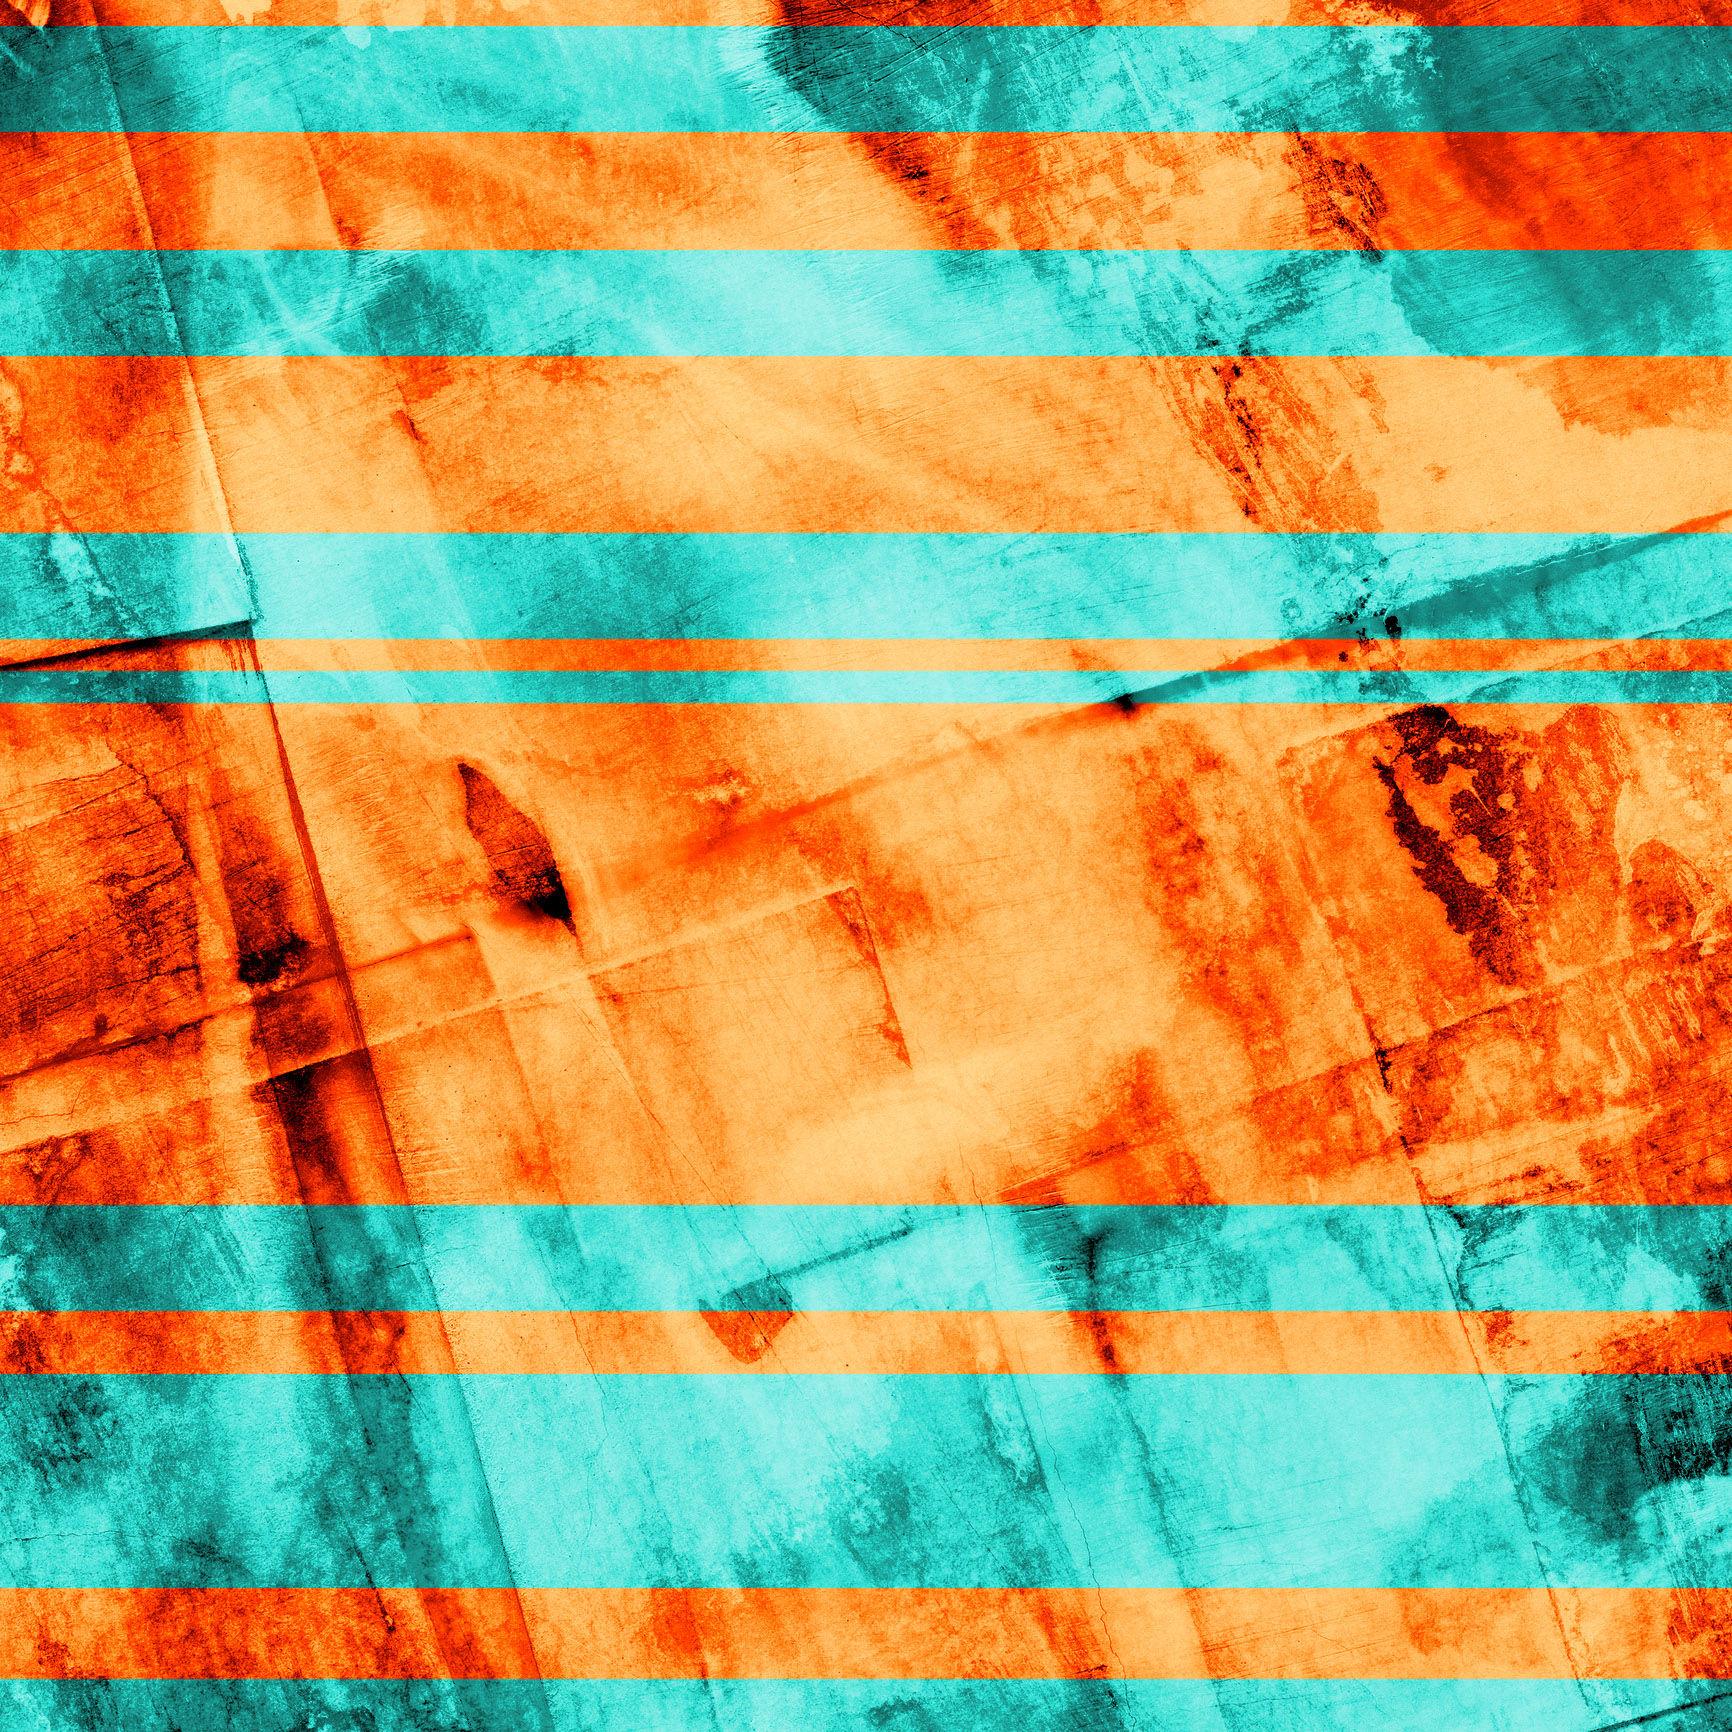 The Orange & Teal Podcast